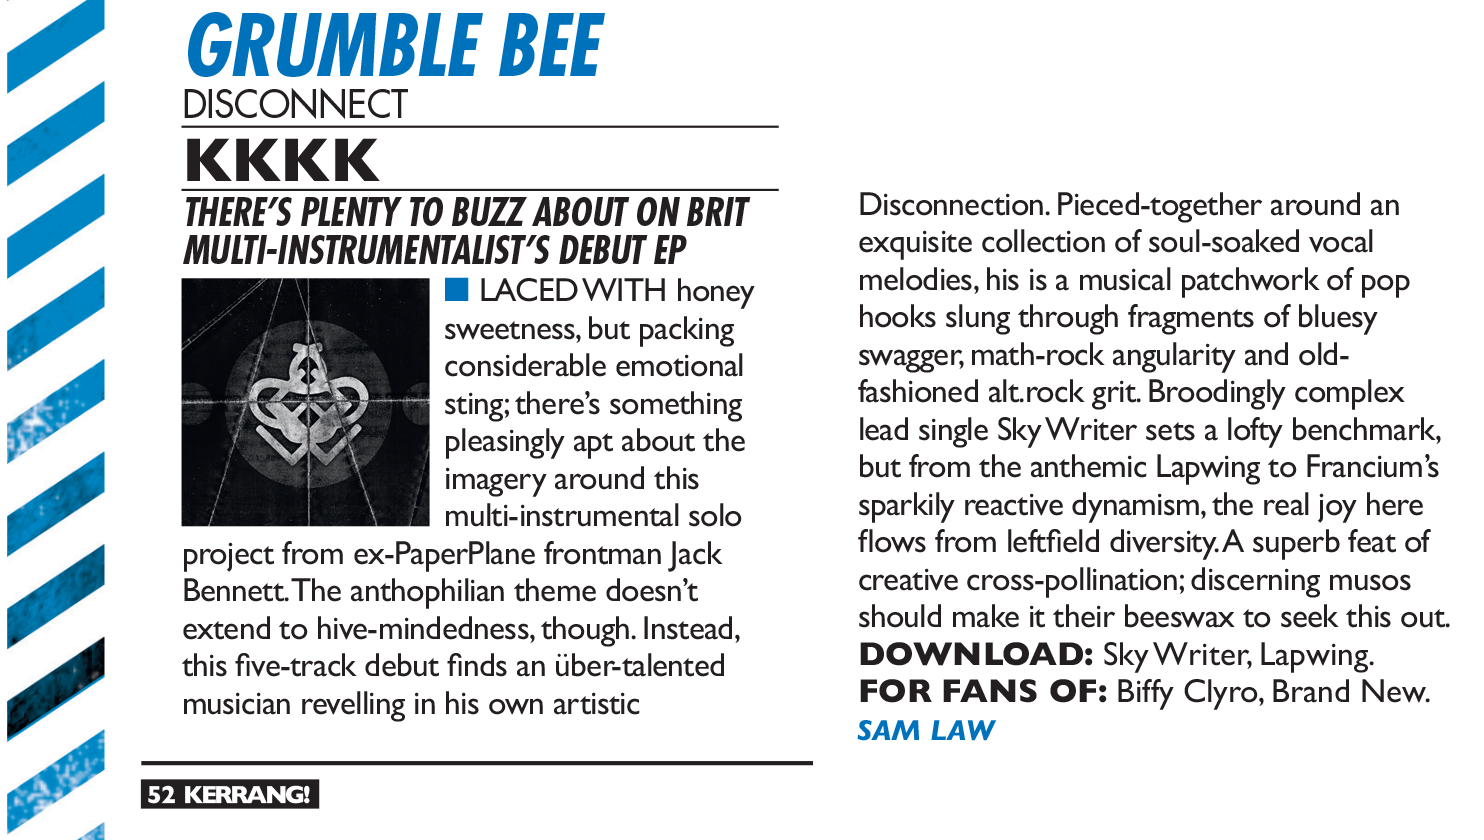 Grumble Bee - Kerrang! Review